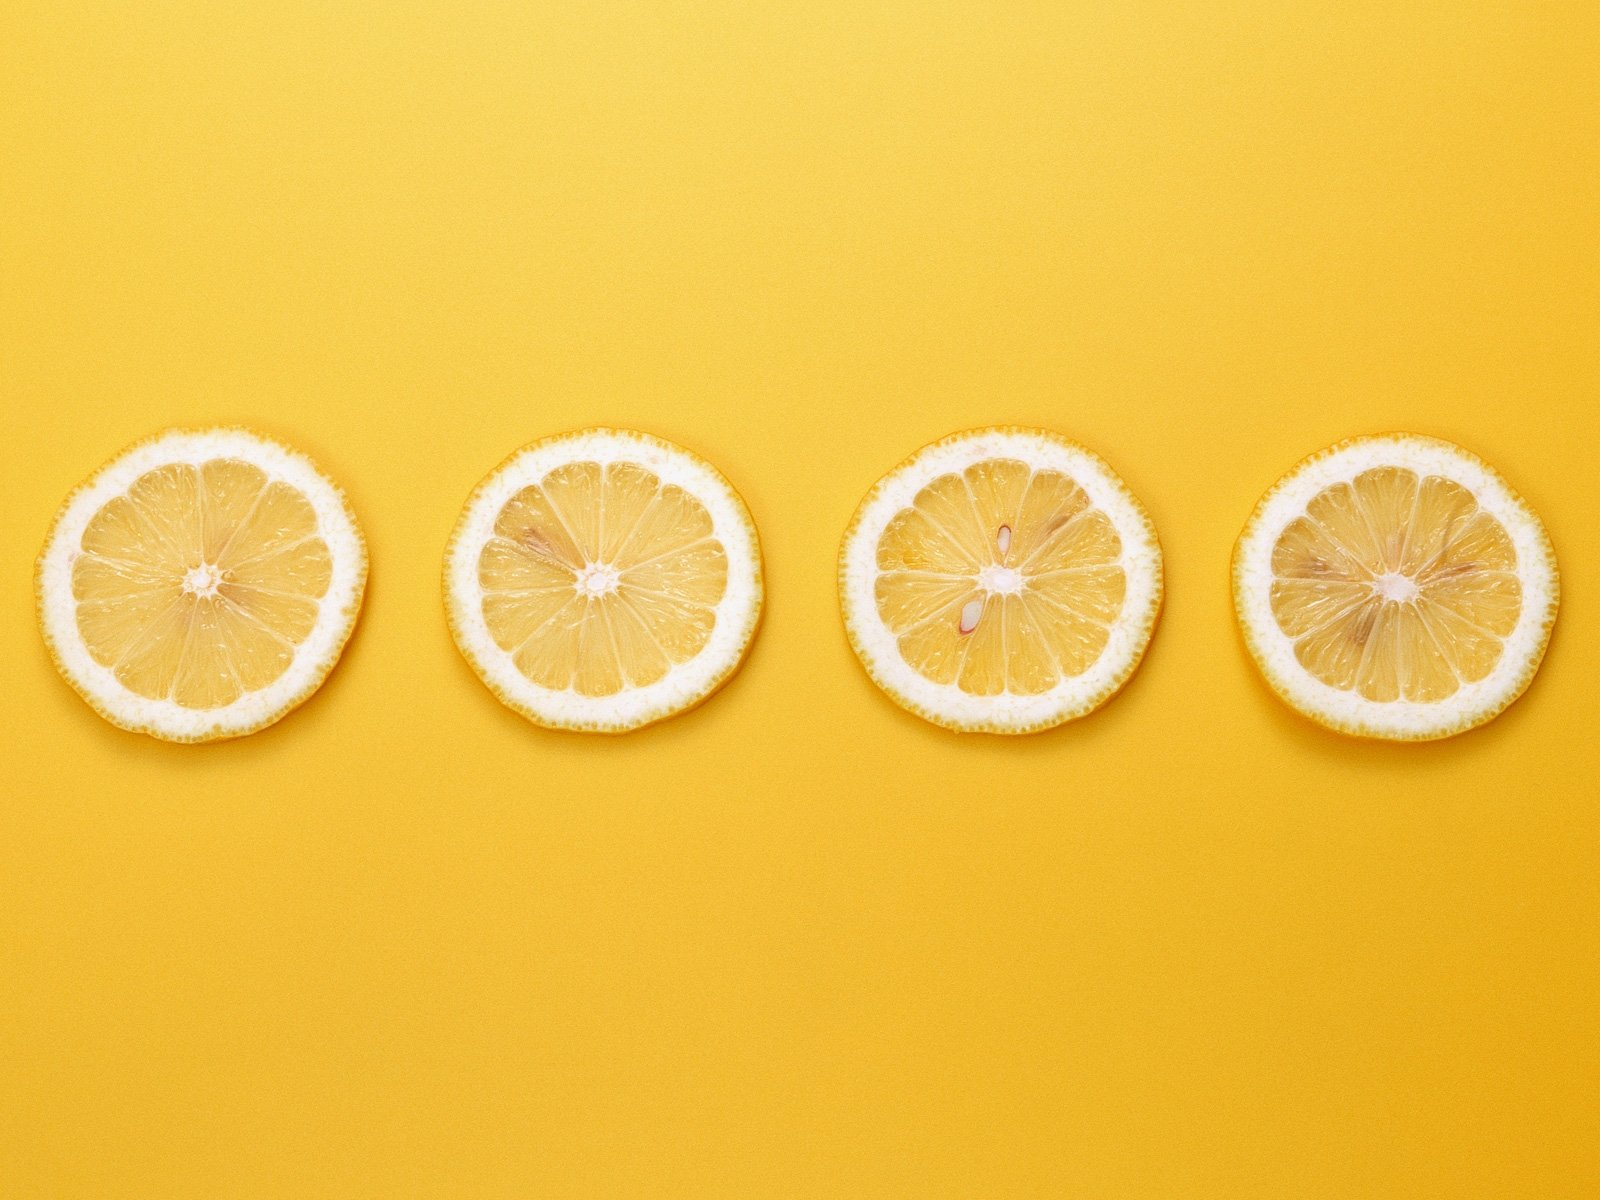 Free Download Cute Fruits Wallpaper 4 Lemons In A Line Yellow